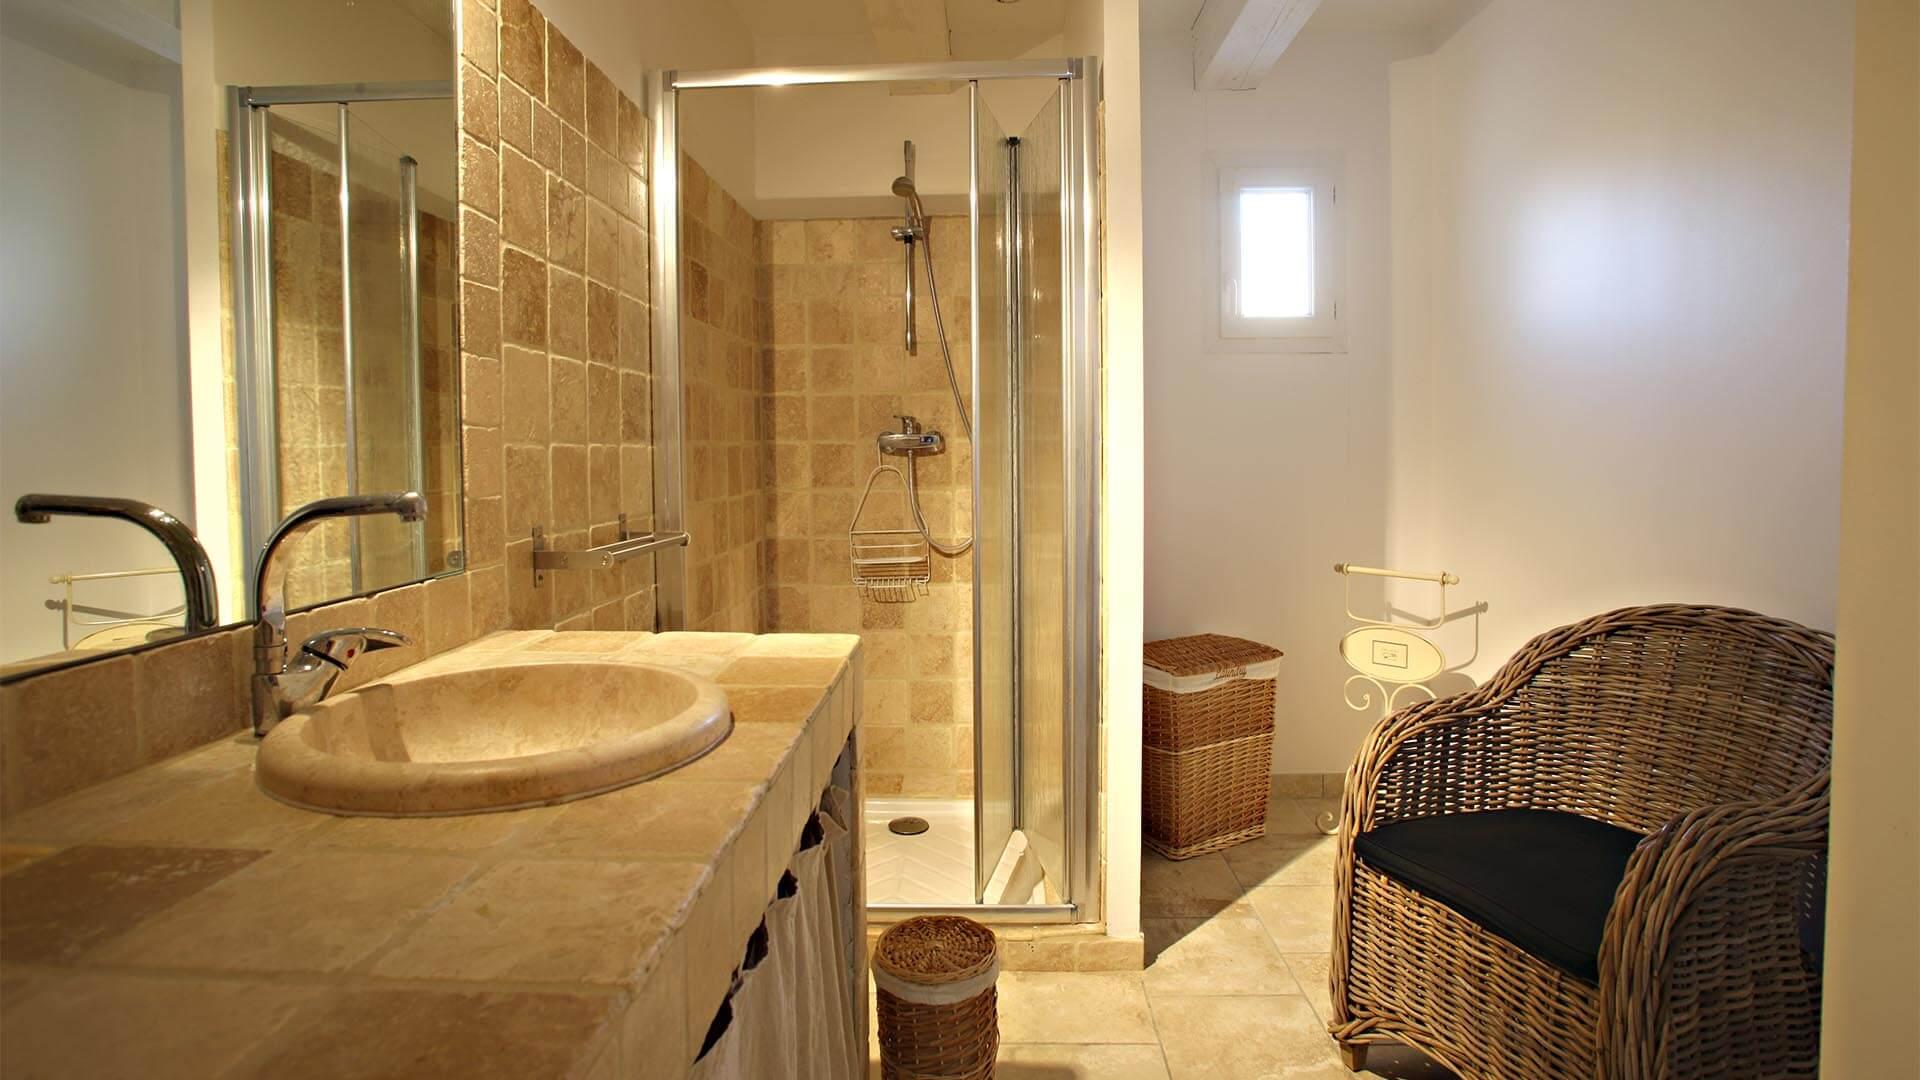 Location vacances T3 Forcalquier | Villa mon rêve | Salle de bain